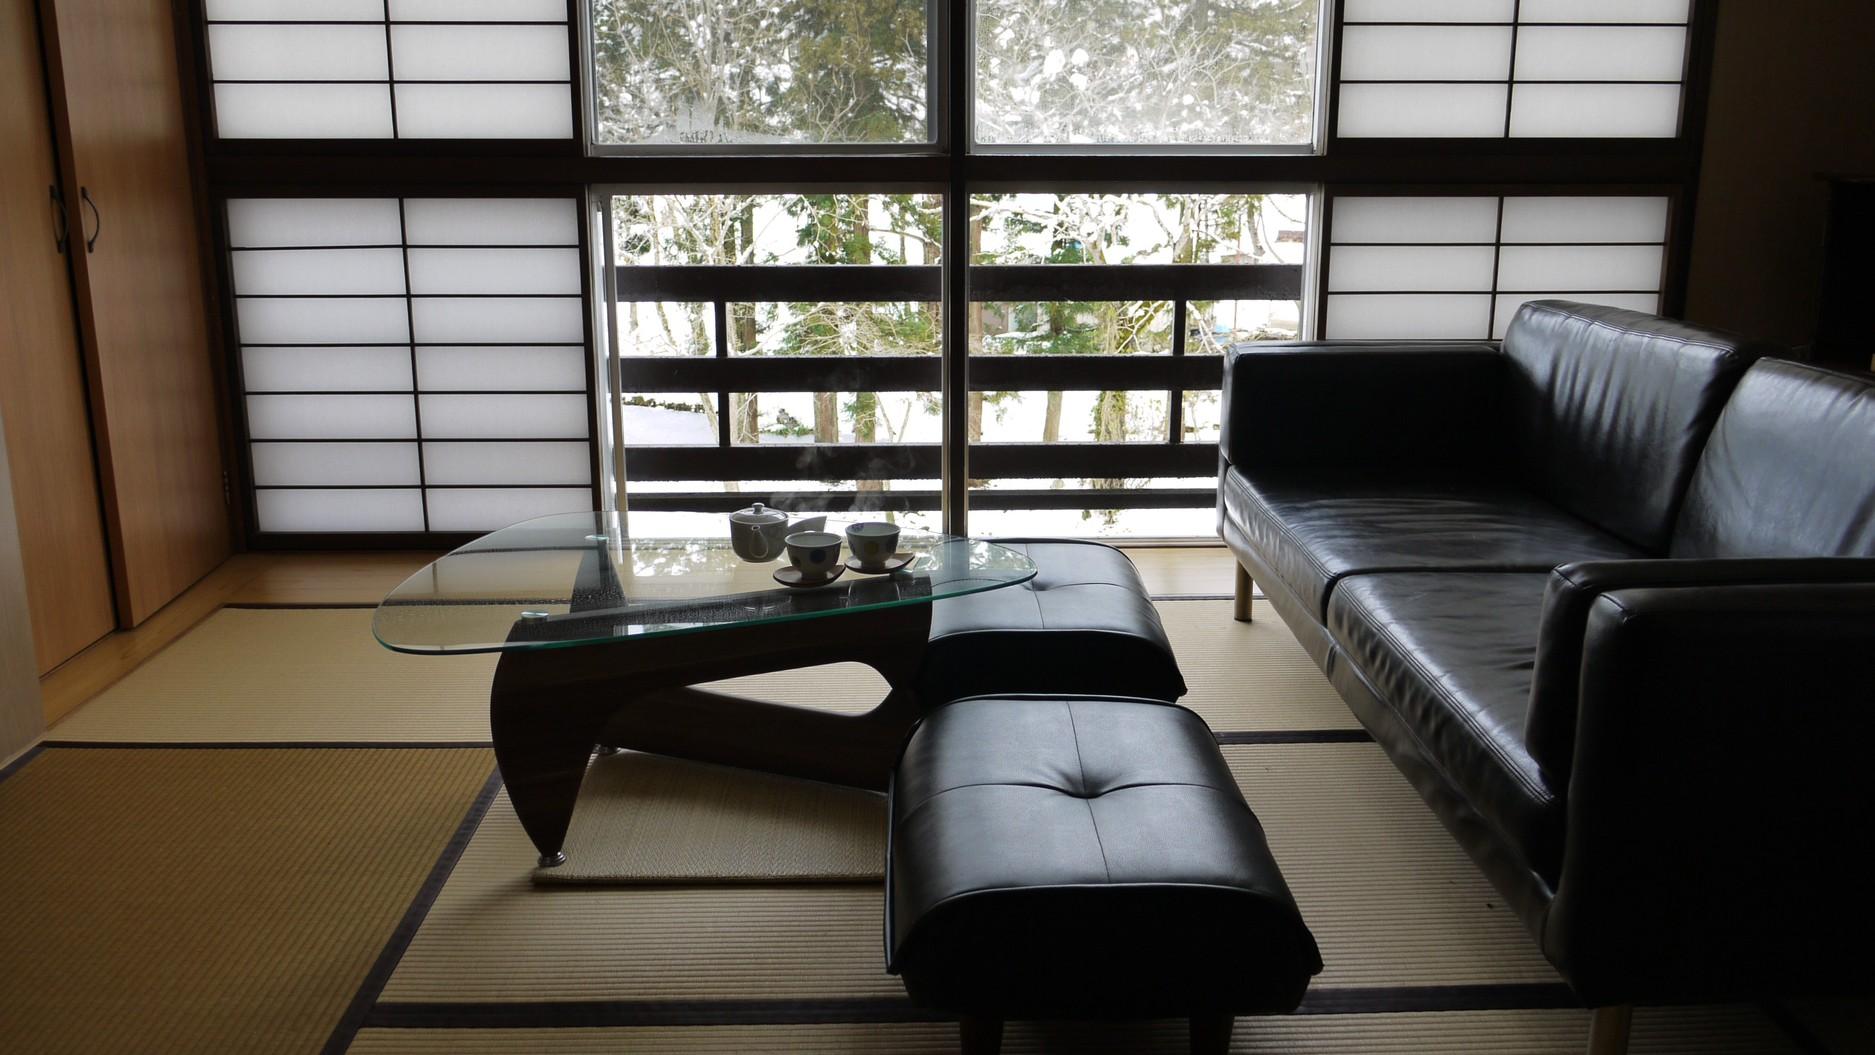 ◆ TomoyaHotel room ◆